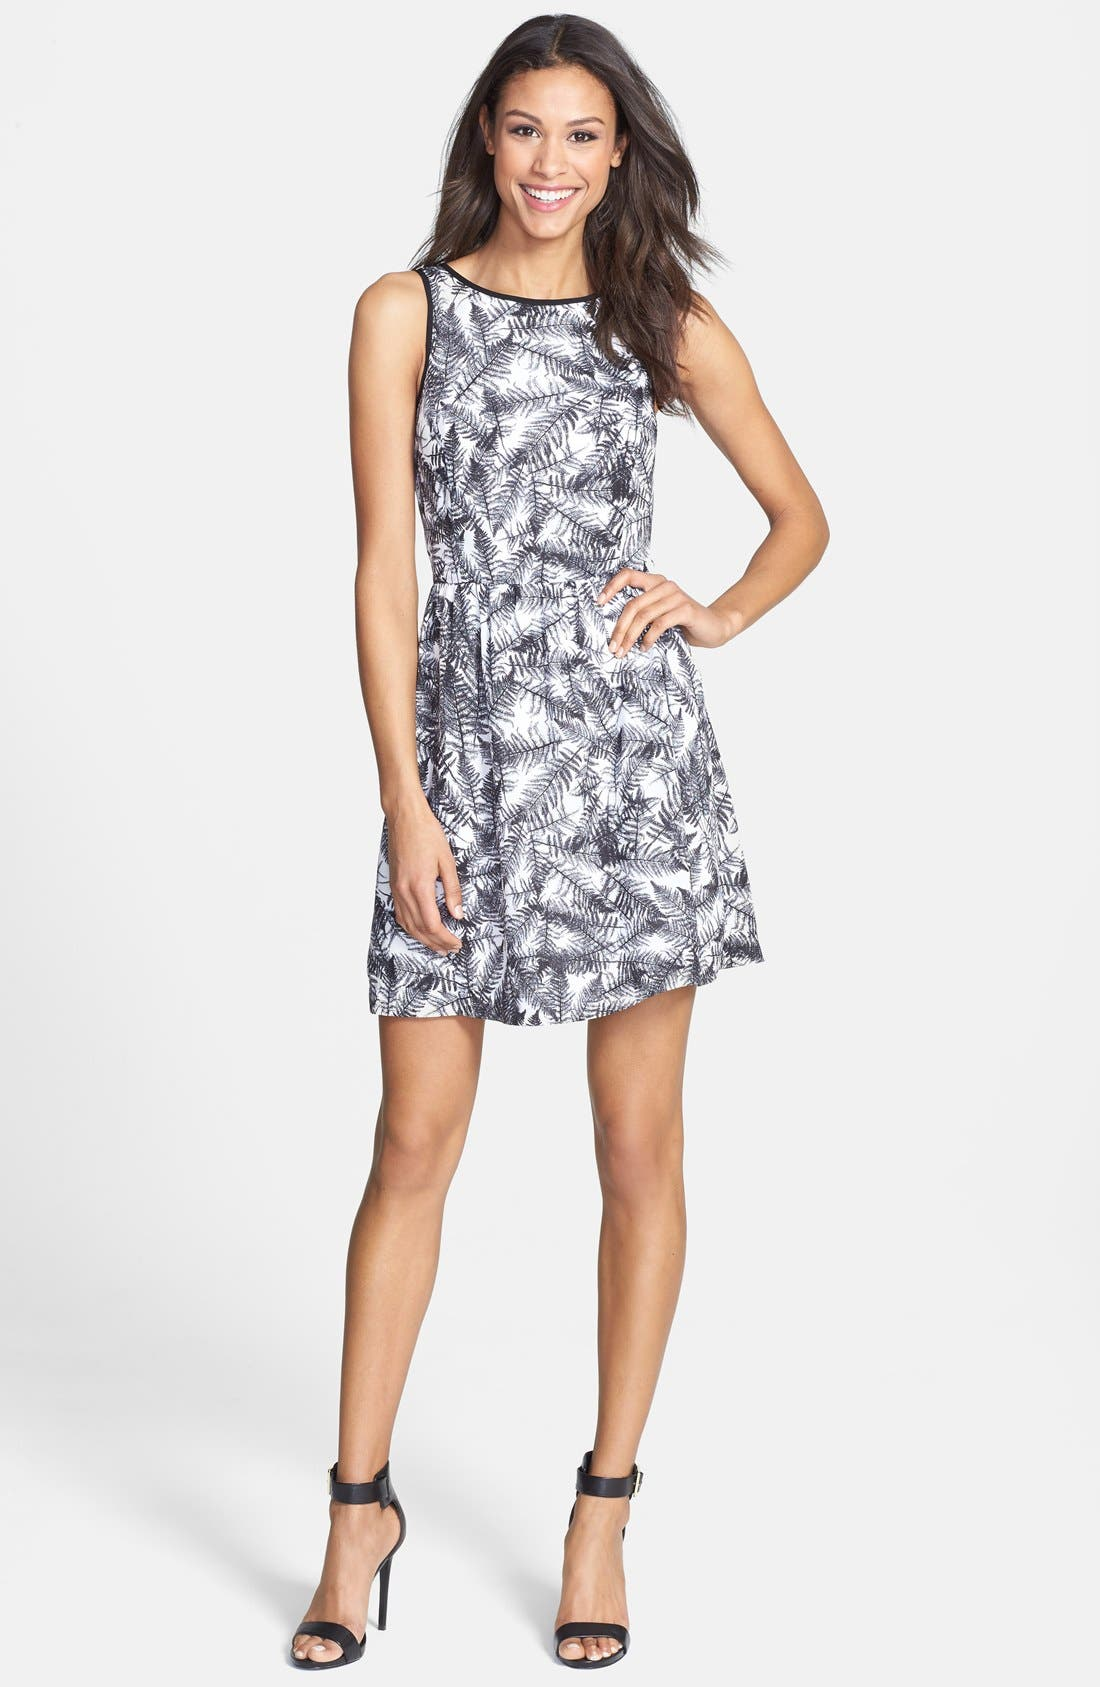 Alternate Image 1 Selected - kensie 'Overlapped Ferns' Print Fit & Flare Dress